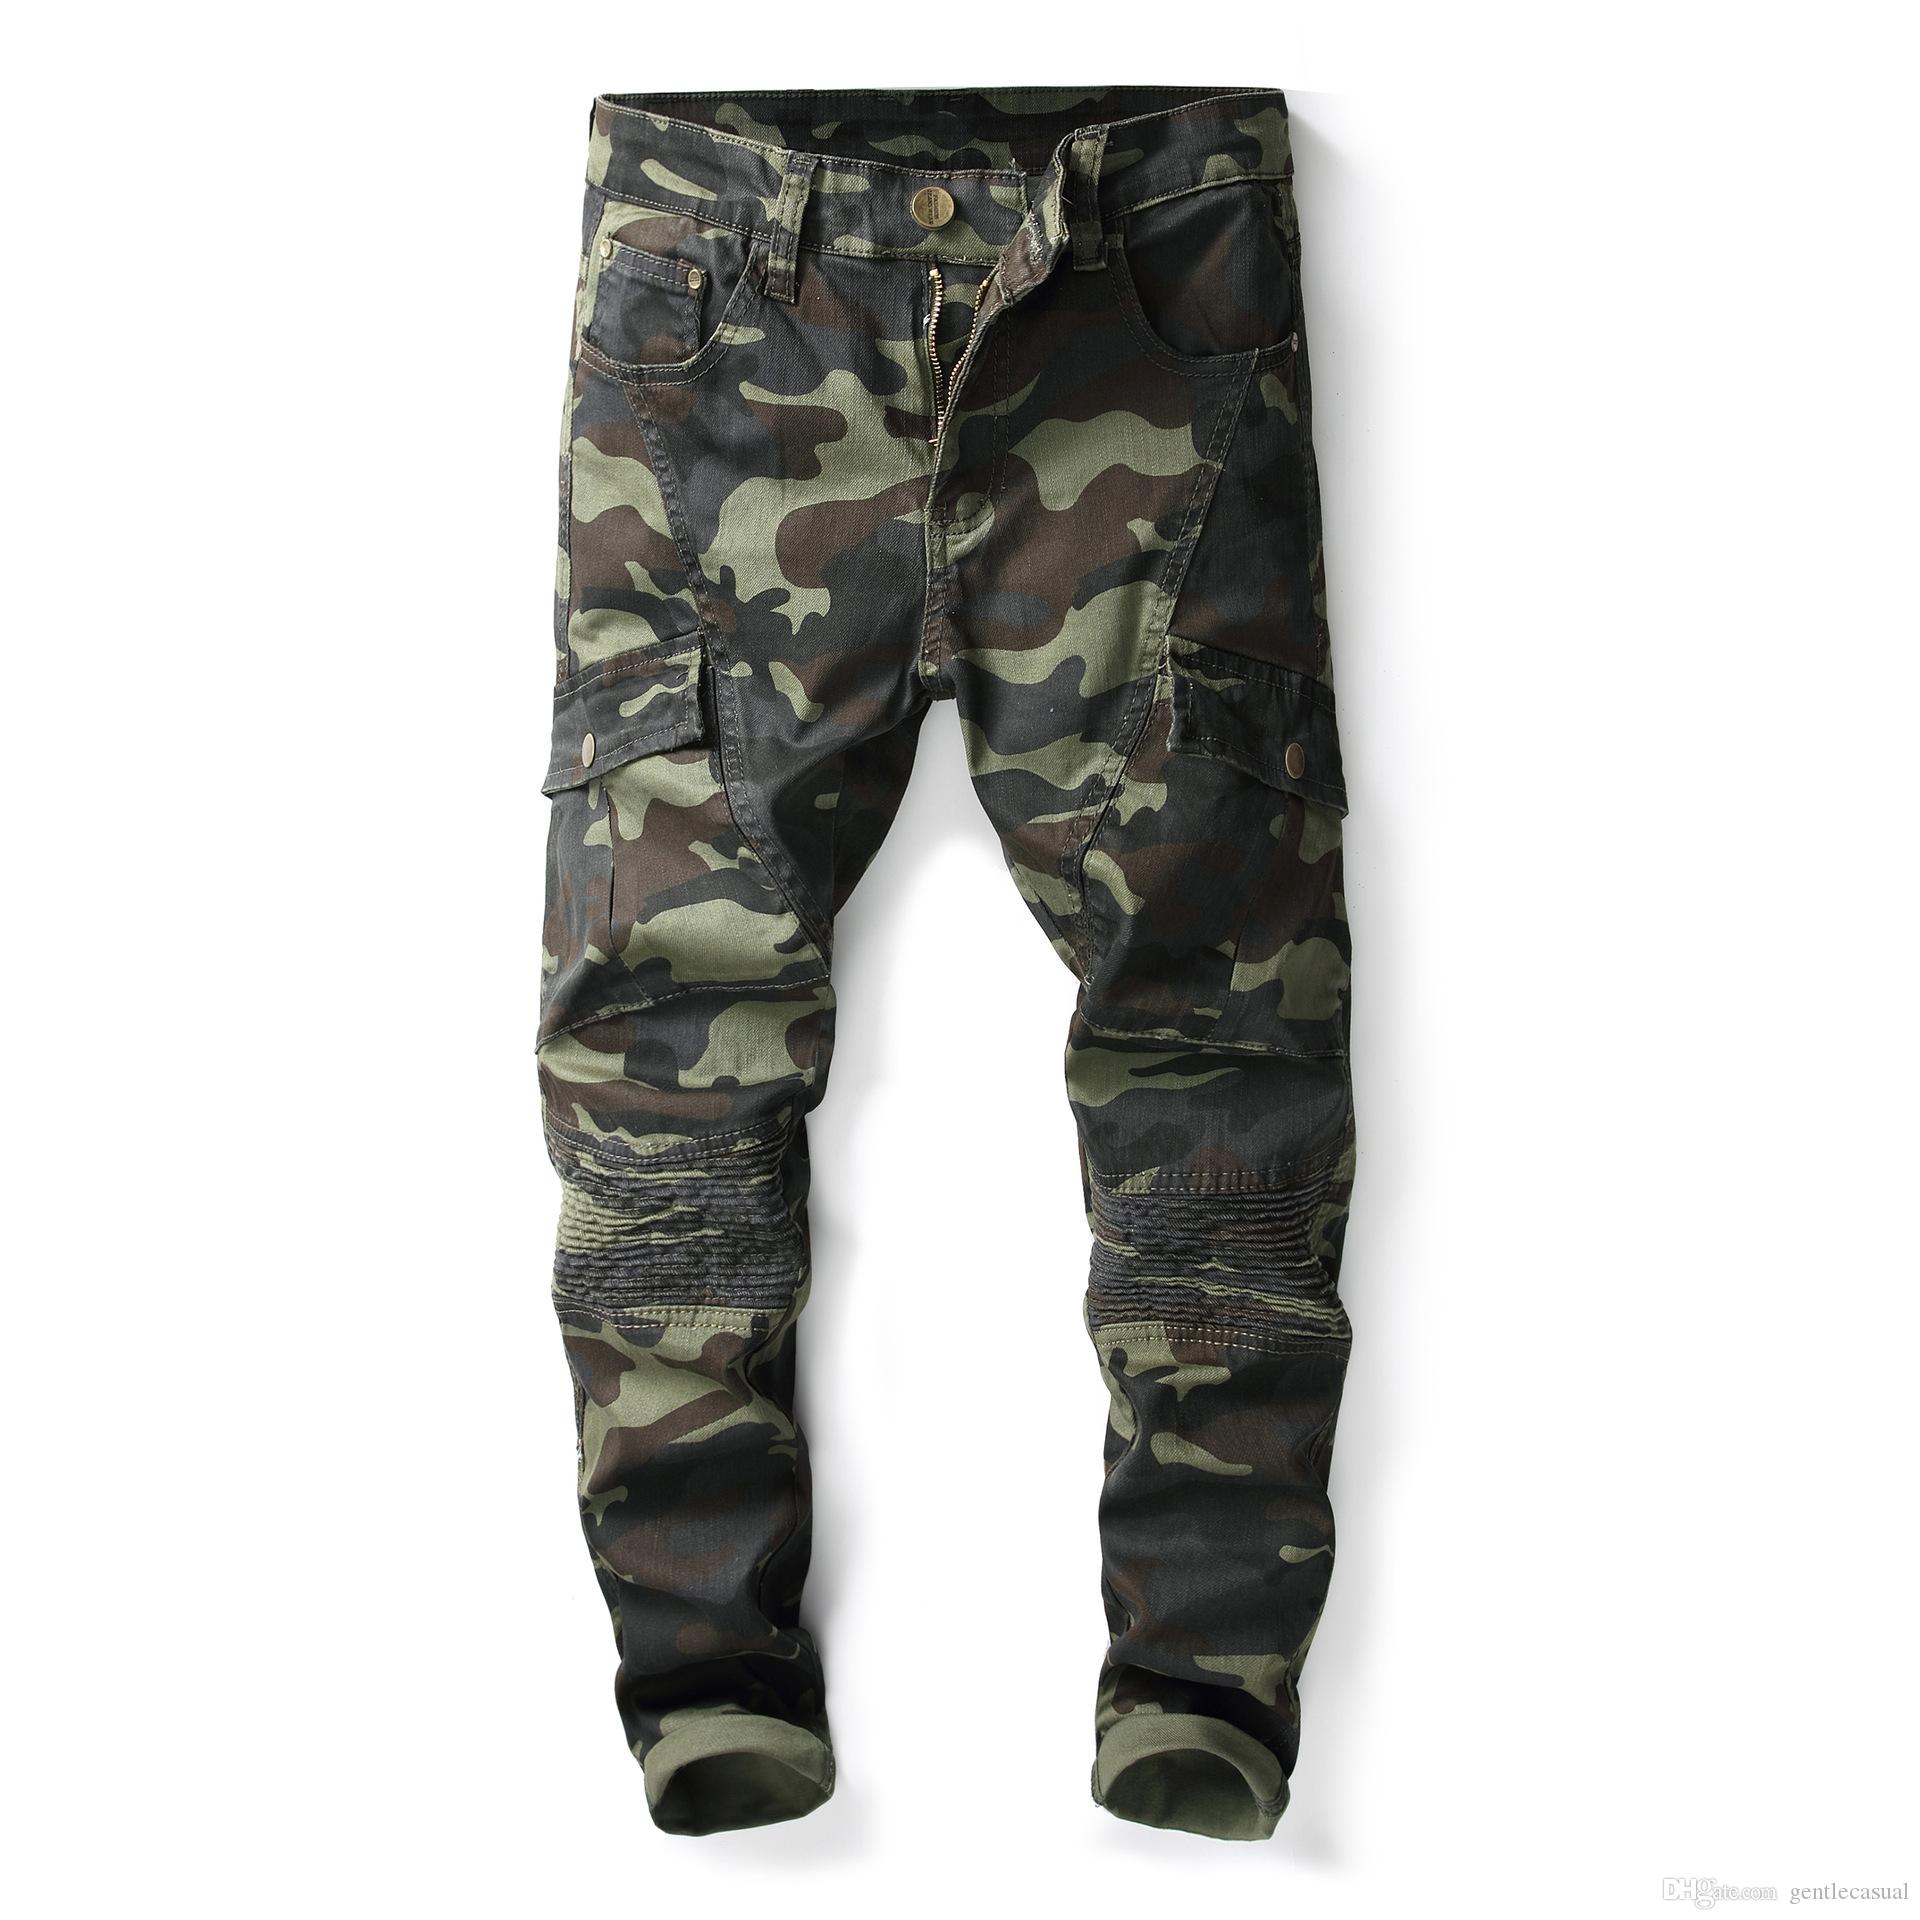 Compre Pantalones Vaqueros De Camuflaje Para Hombre Skinny Slim Fit  Pantalones Estilo Militar Multi Bolsillos Jeans Elásticos Pantalones Para  Niños 29 38 A ... b193e705916